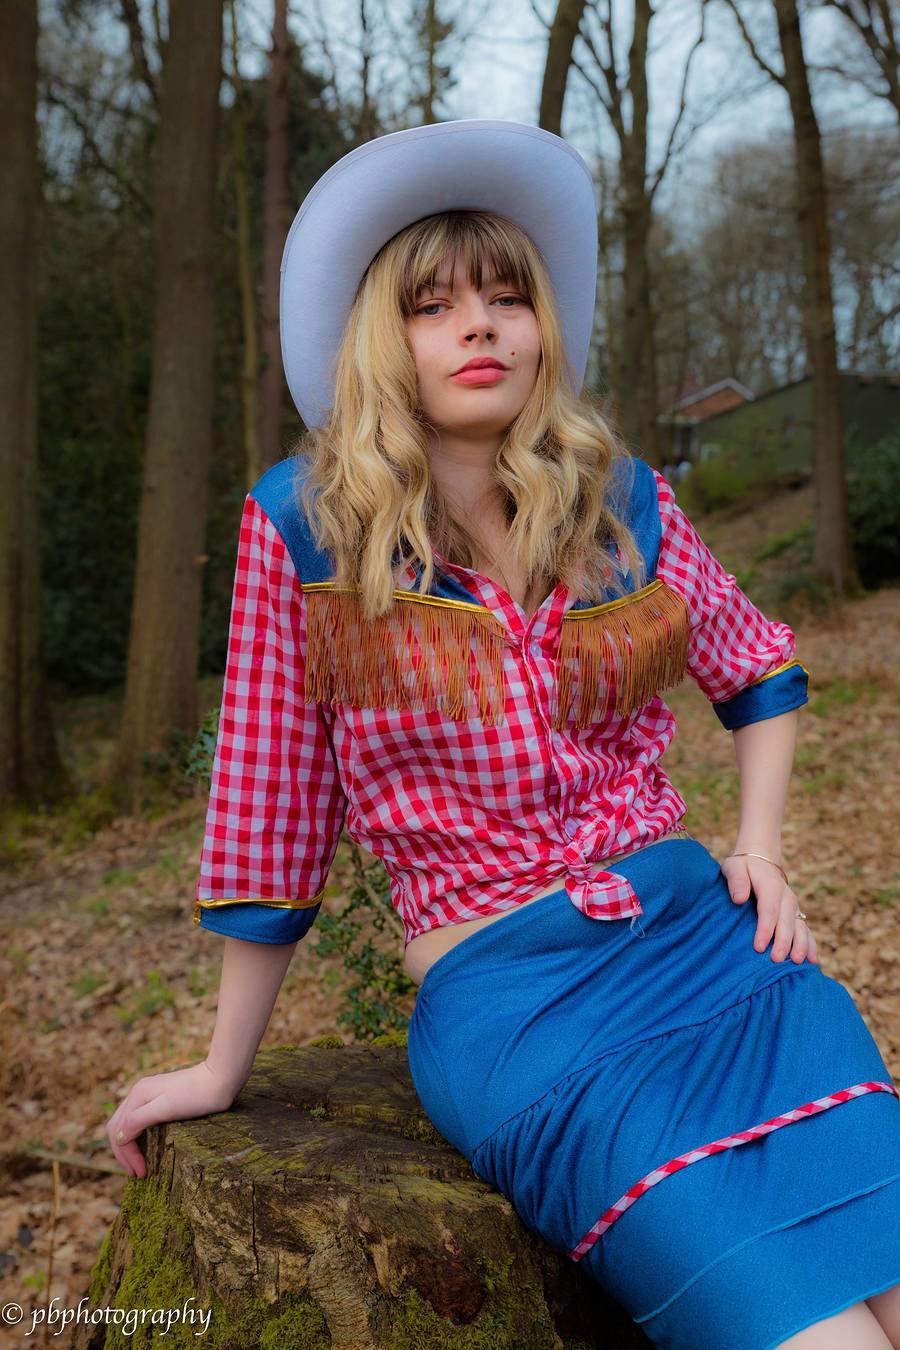 Country shoot / Model Jade3, Taken at Far Forest Studio / Uploaded 22nd April 2018 @ 06:47 PM